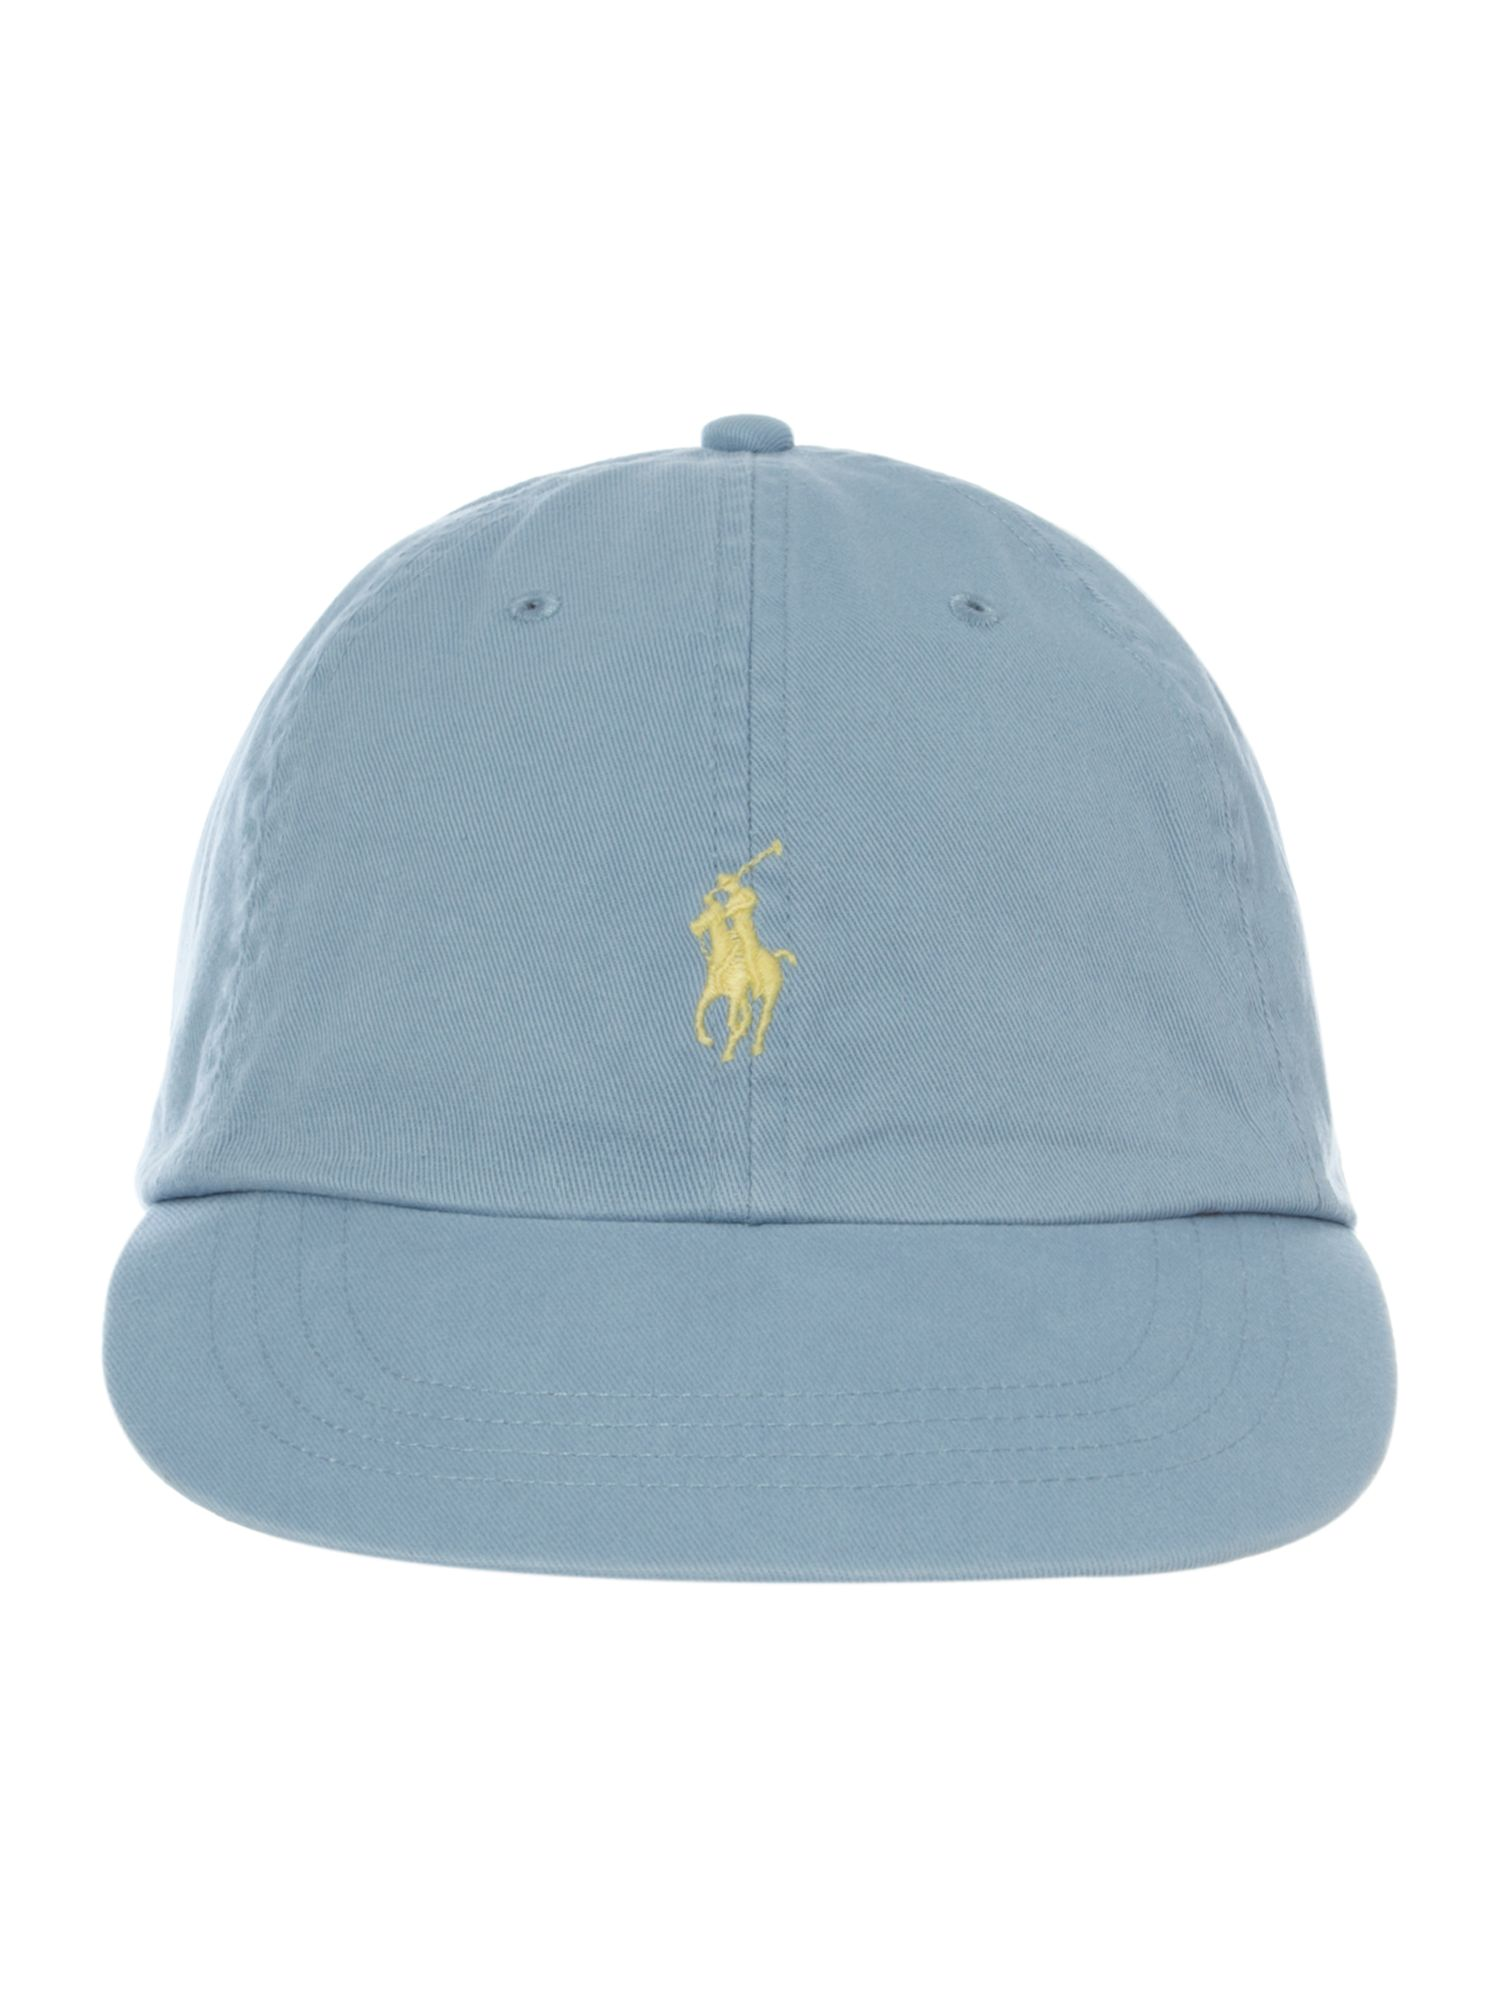 polo ralph lauren baseball cap in blue for men lyst. Black Bedroom Furniture Sets. Home Design Ideas